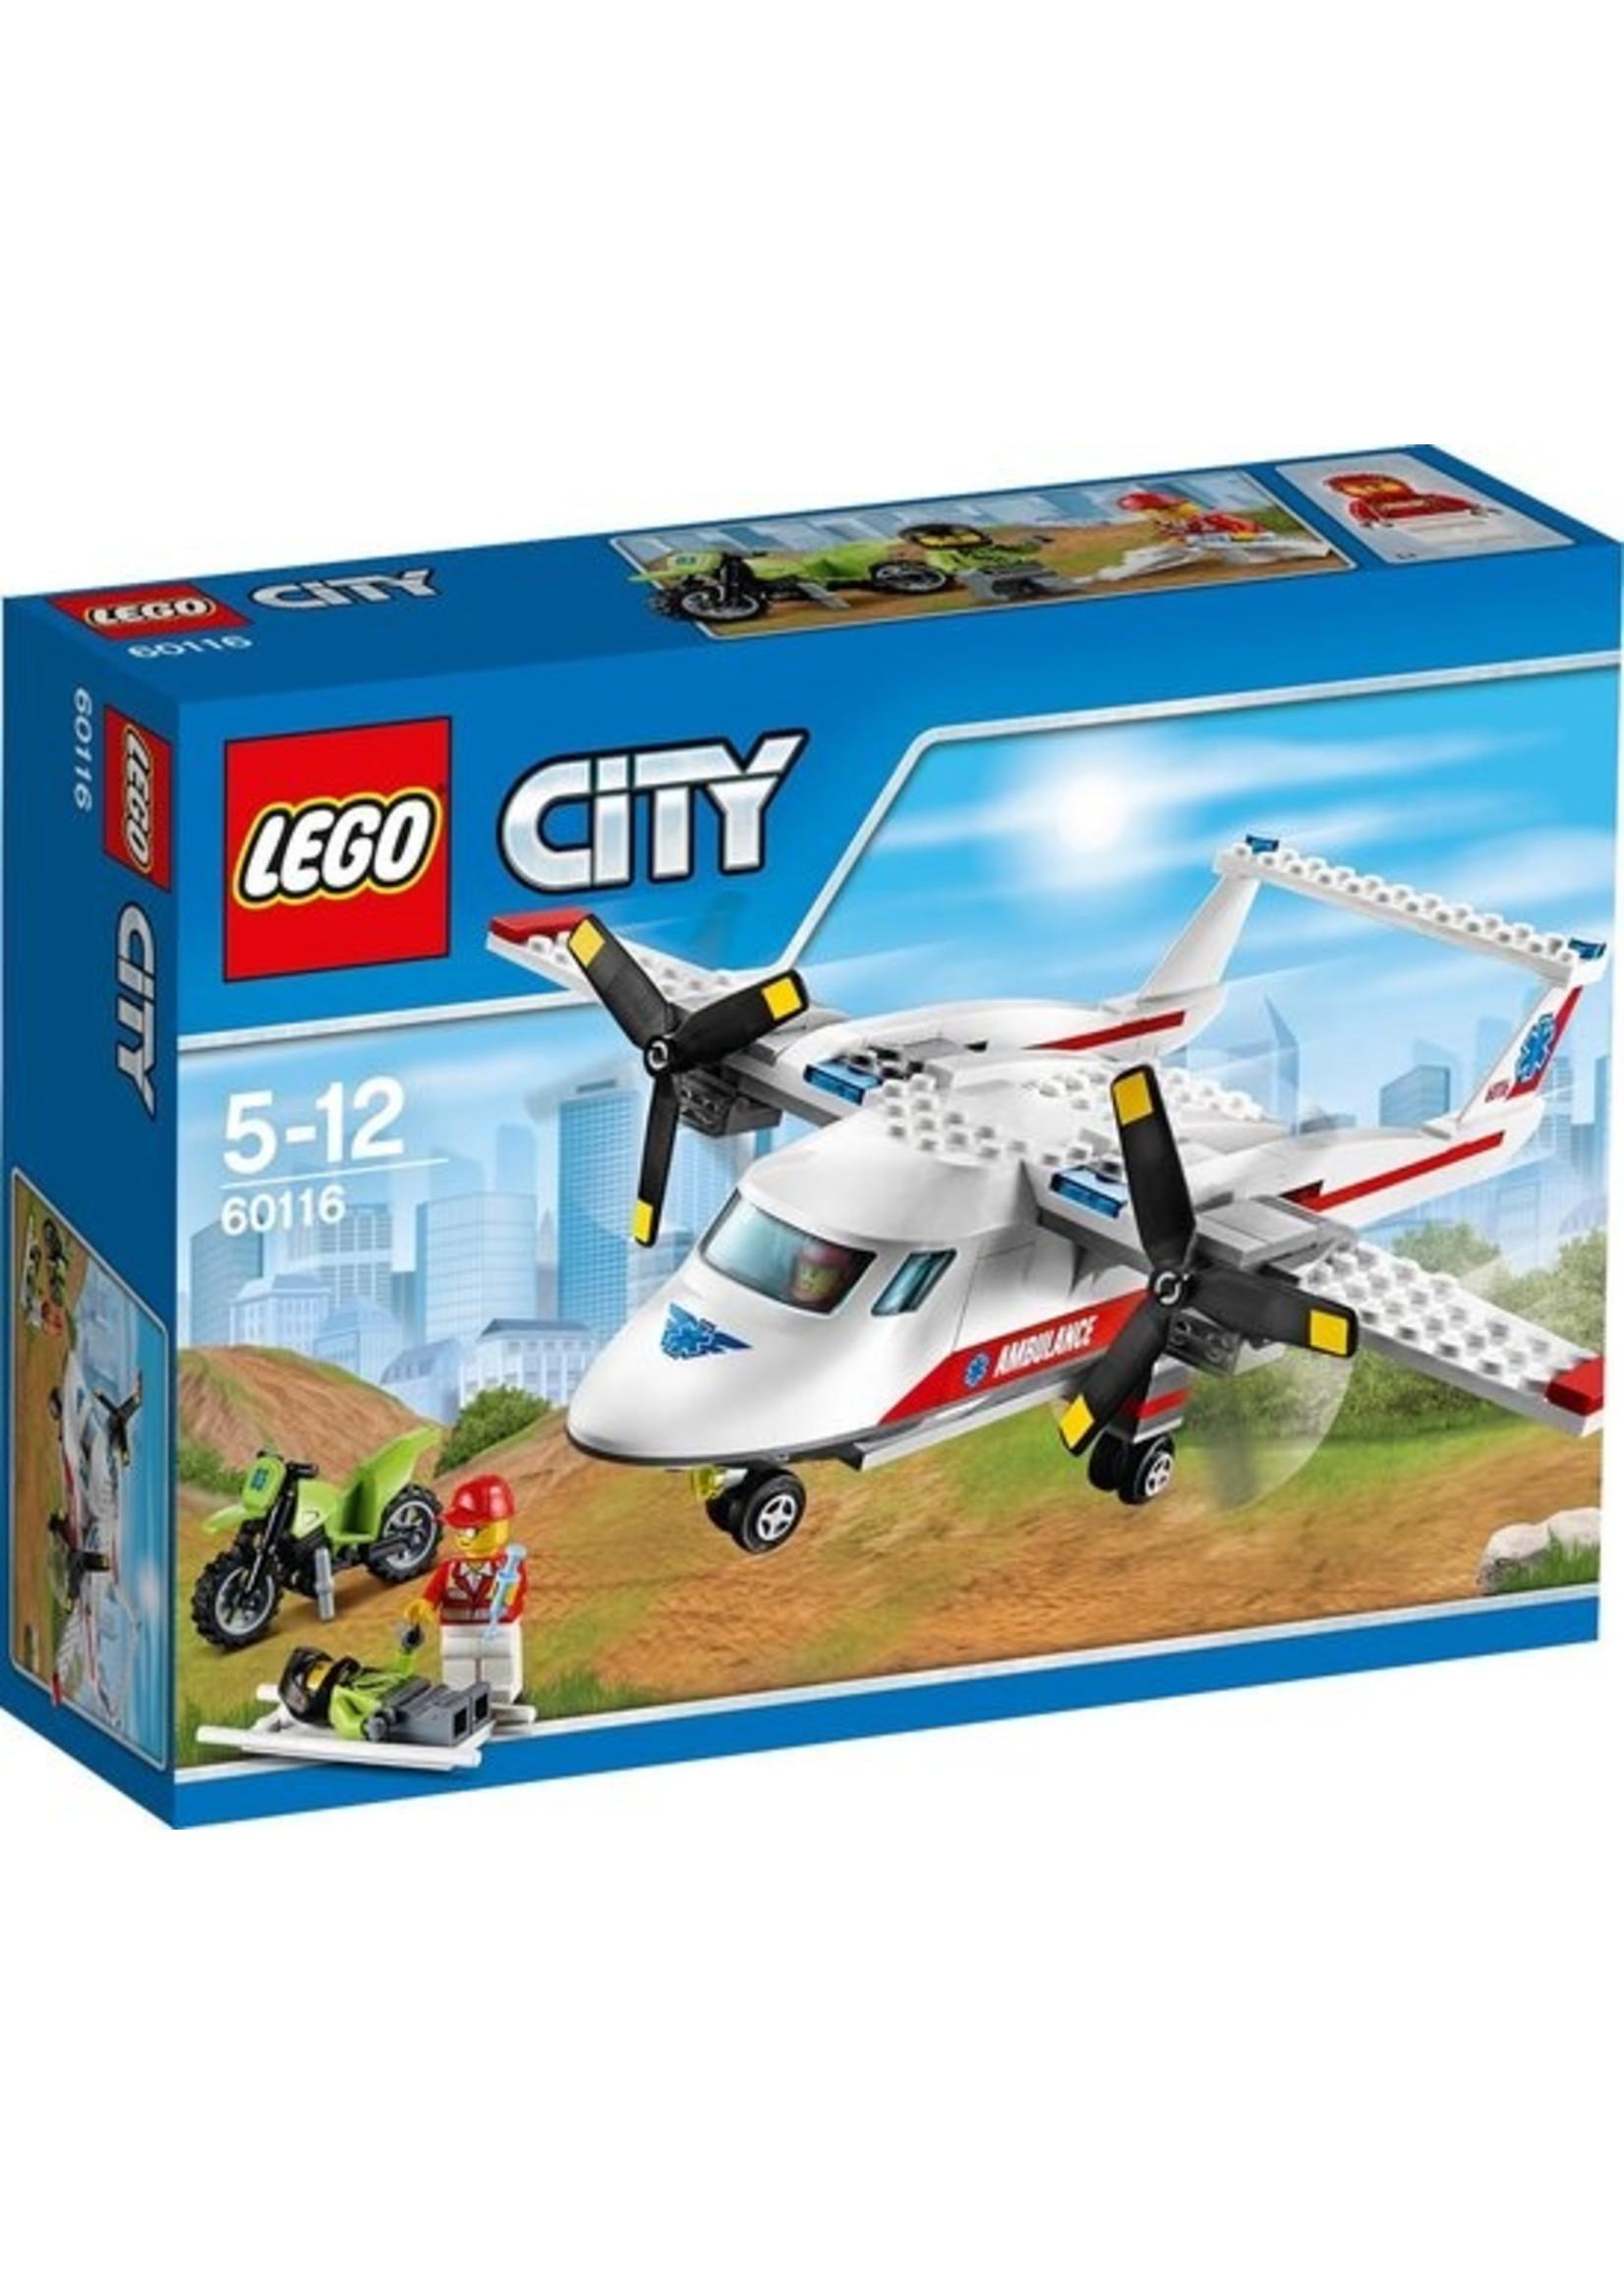 LEGO City Ambulancevliegtuig - 60116